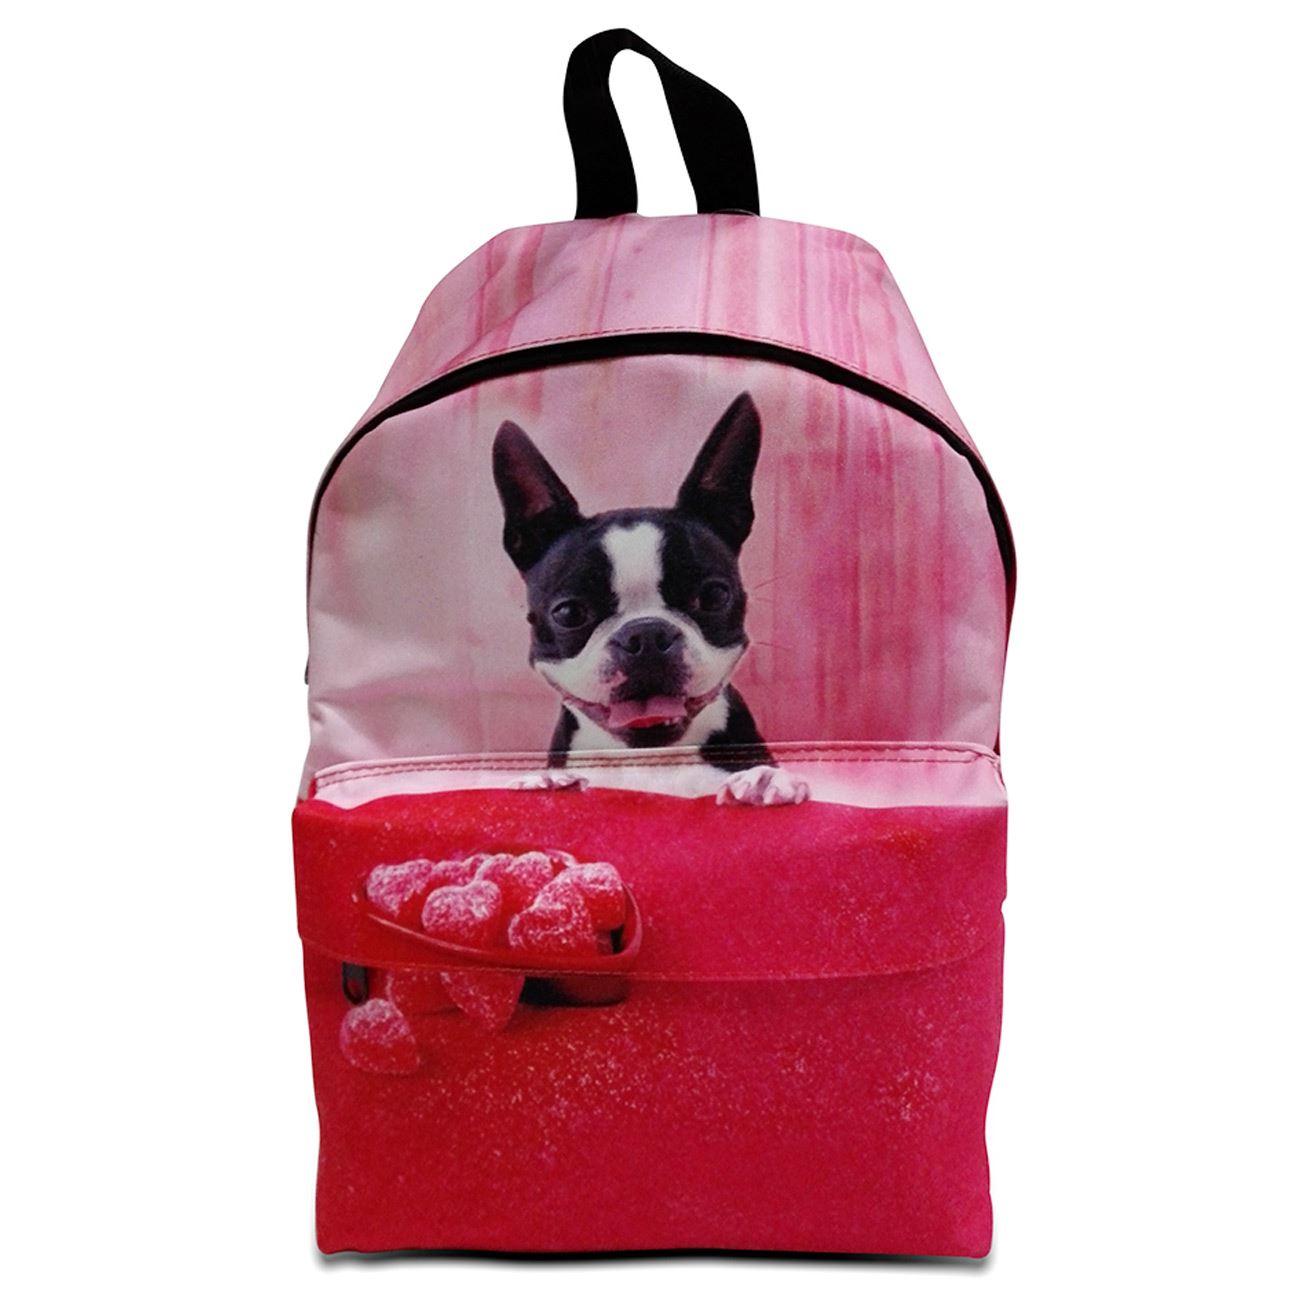 fb8ed5a75a Σχολική Τσάντα Νηπιαγωγείου Σκυλάκι   Τσάντες Προσχολικές Σταγόνα ...